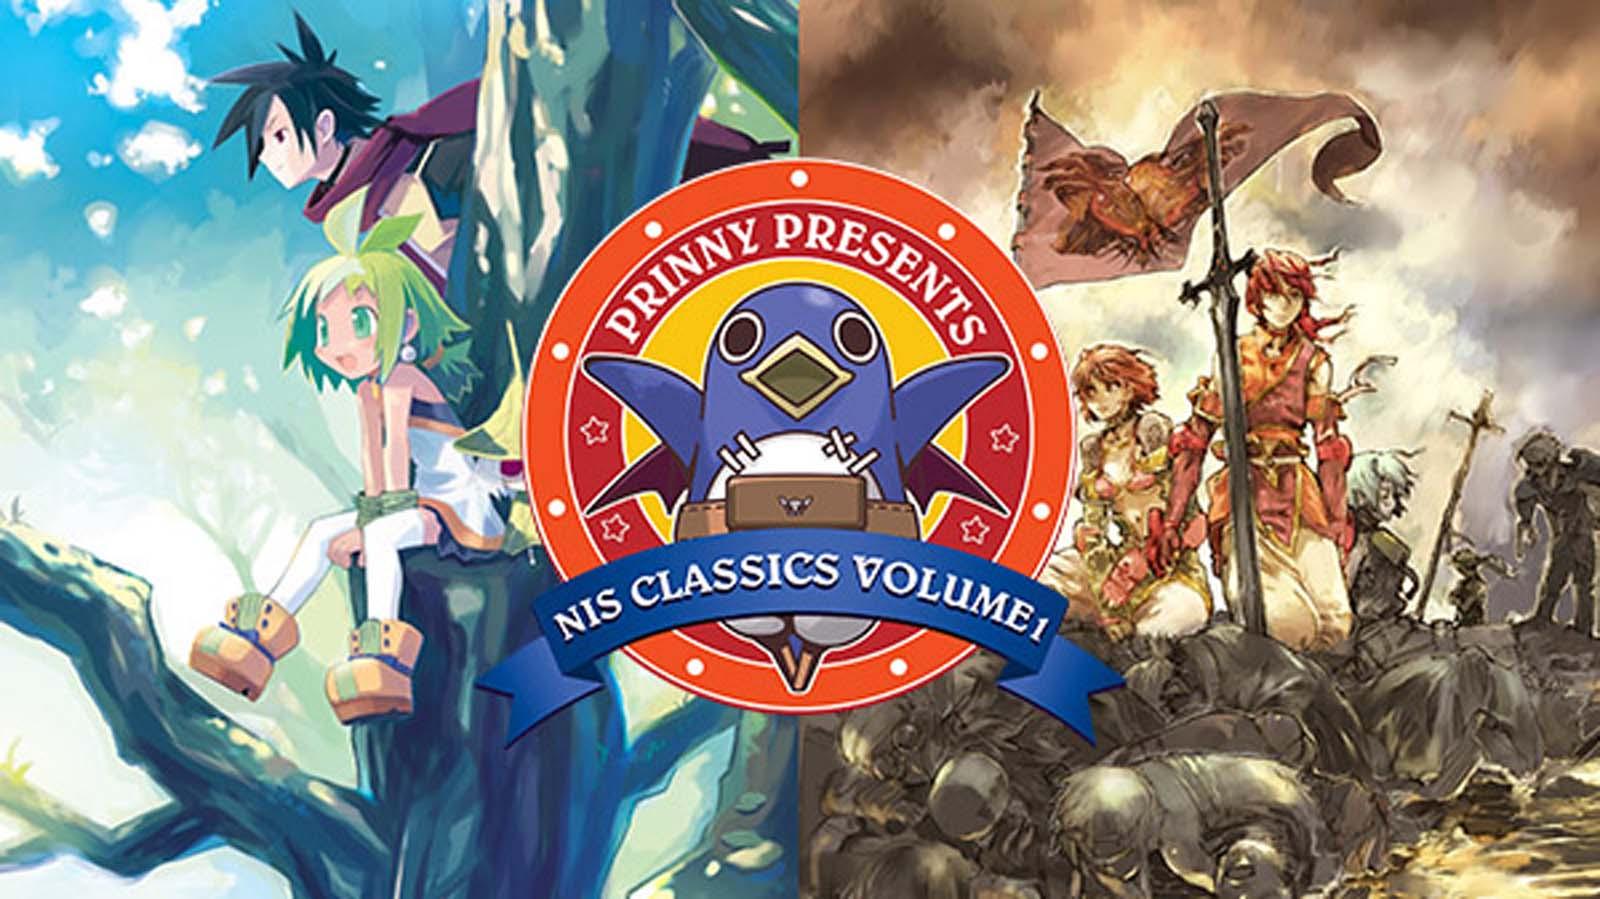 NIS America has revealed Prinny Presents NIS Classics Volume 1